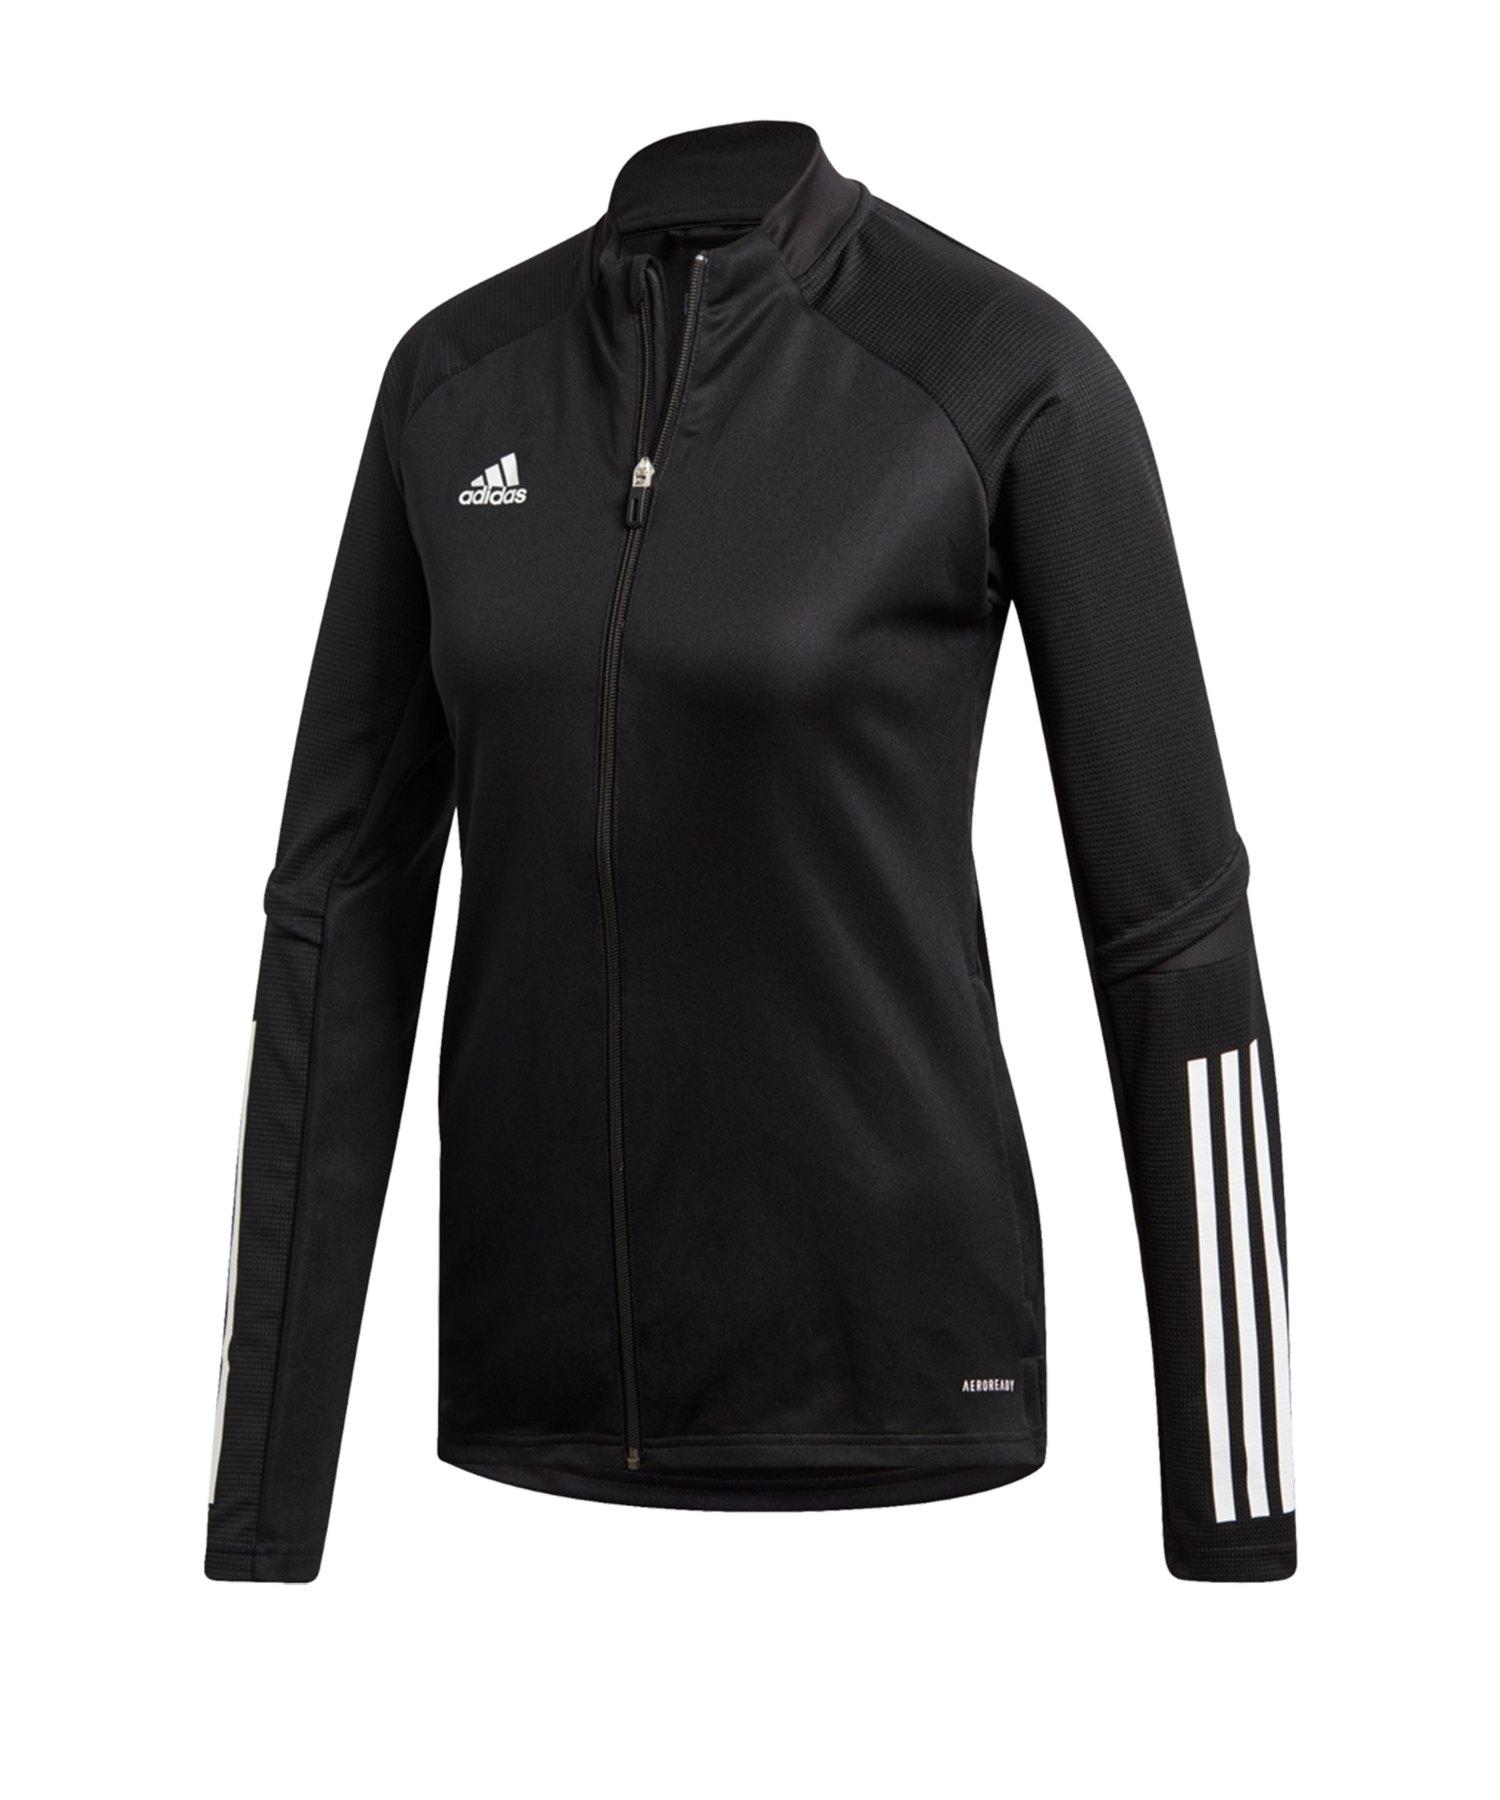 adidas Condivo 20 Trainingsjacke Damen Schwarz - schwarz